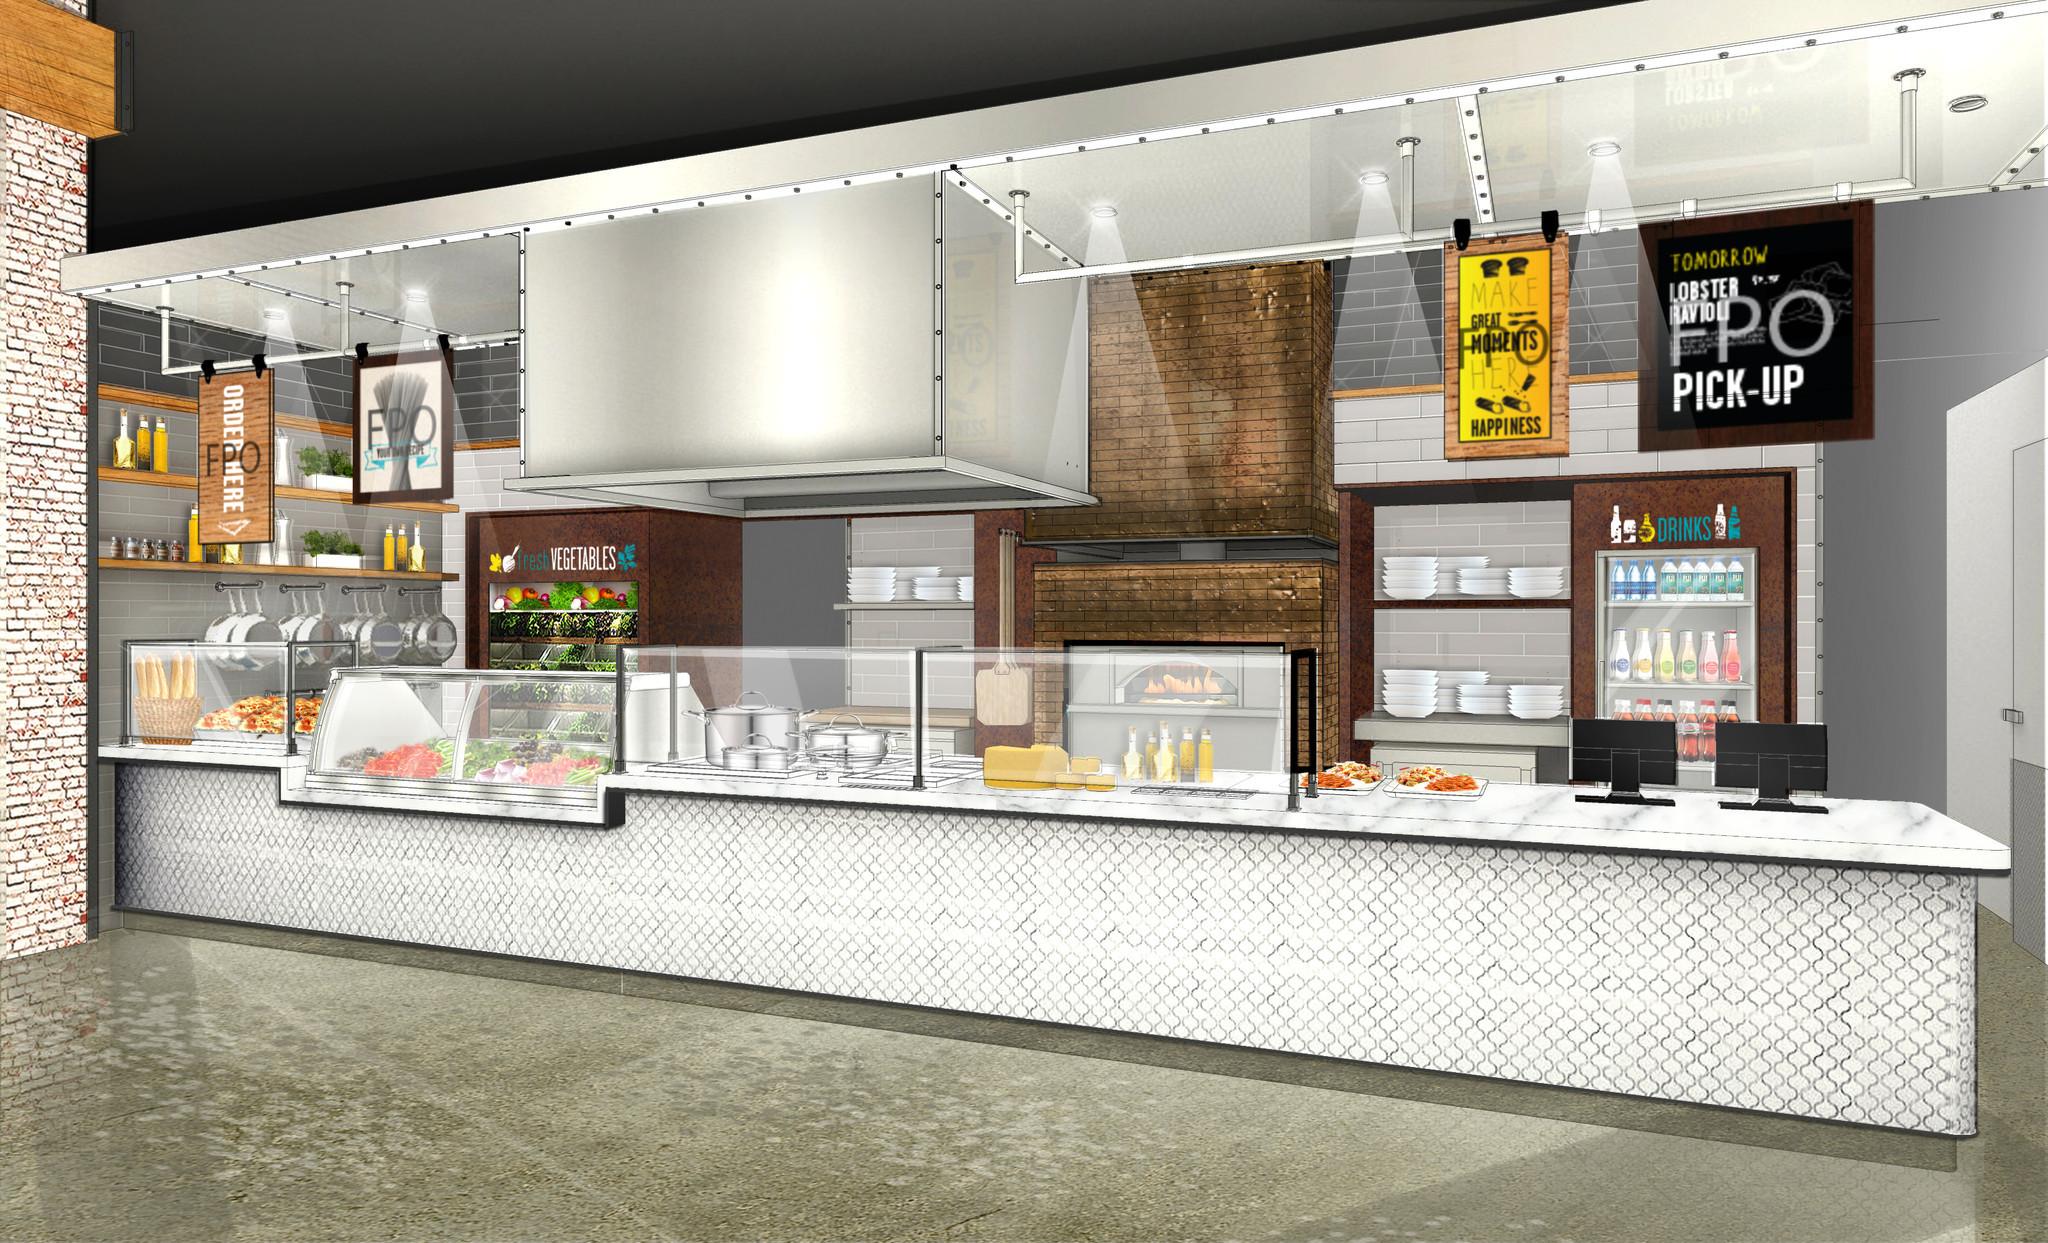 Italian Food Via Brazil Spoleto Restaurant Opening Near Ucf Orlando Sentinel